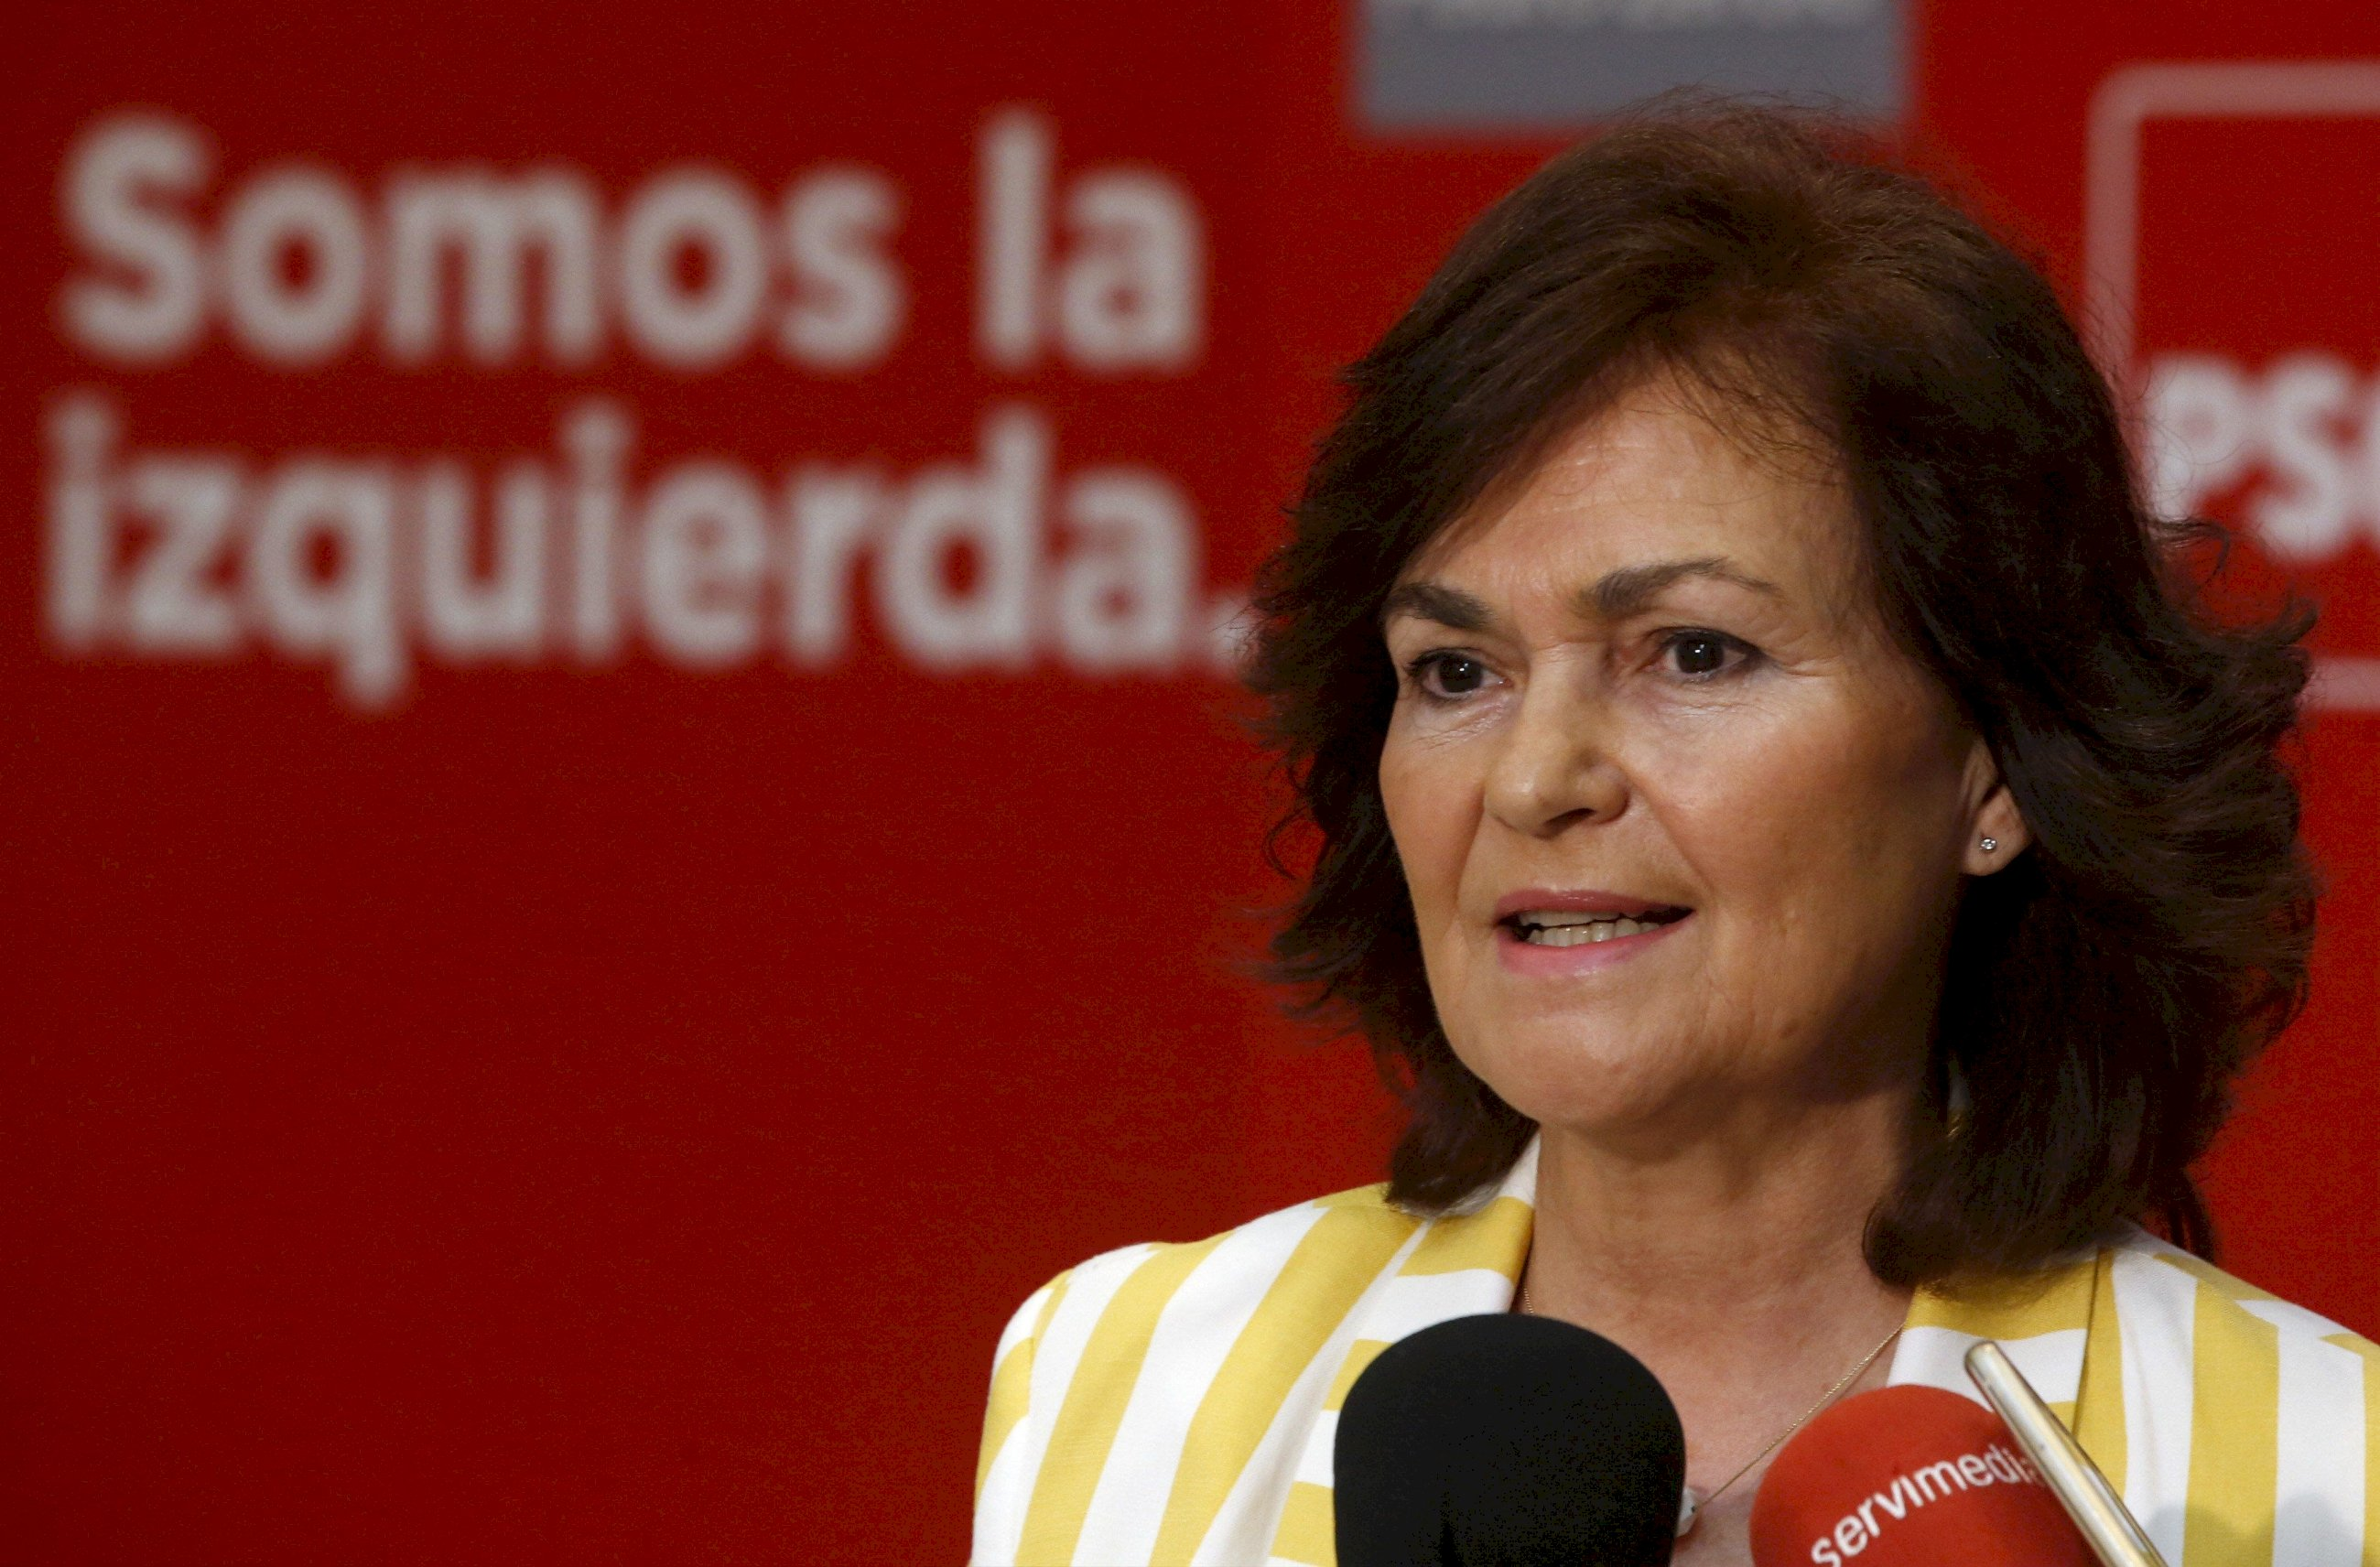 La ex vicepresidenta Carmen Calvo se postula como presidenta del PSOE. Foto: EFE